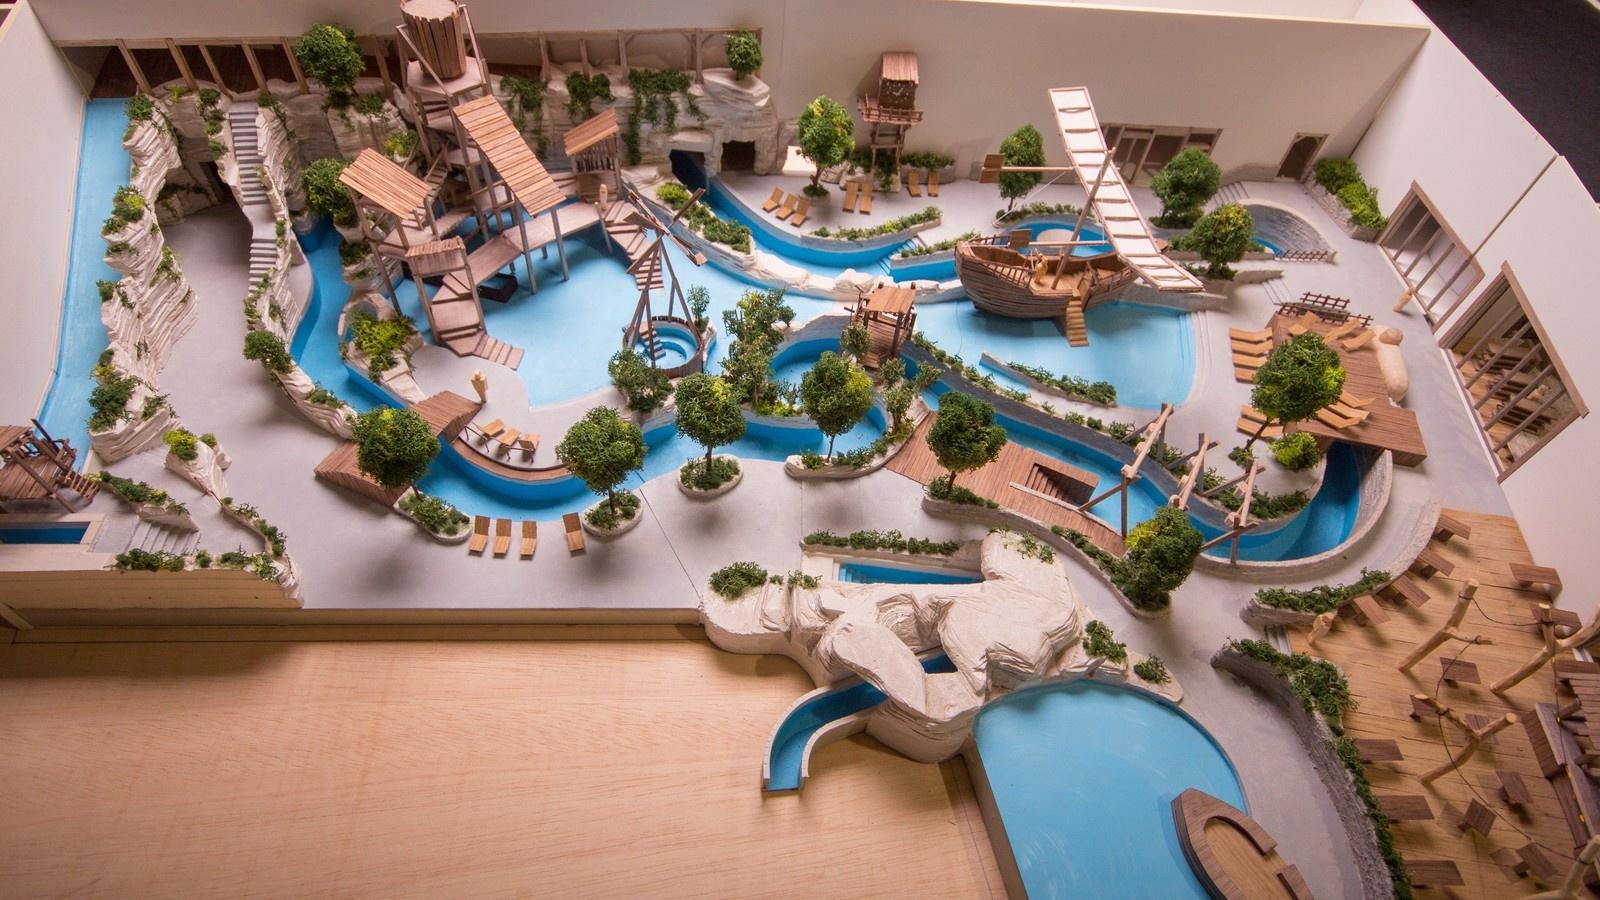 Search Results - Themeparx: Theme Park Construction Board dedans Piscine Menin